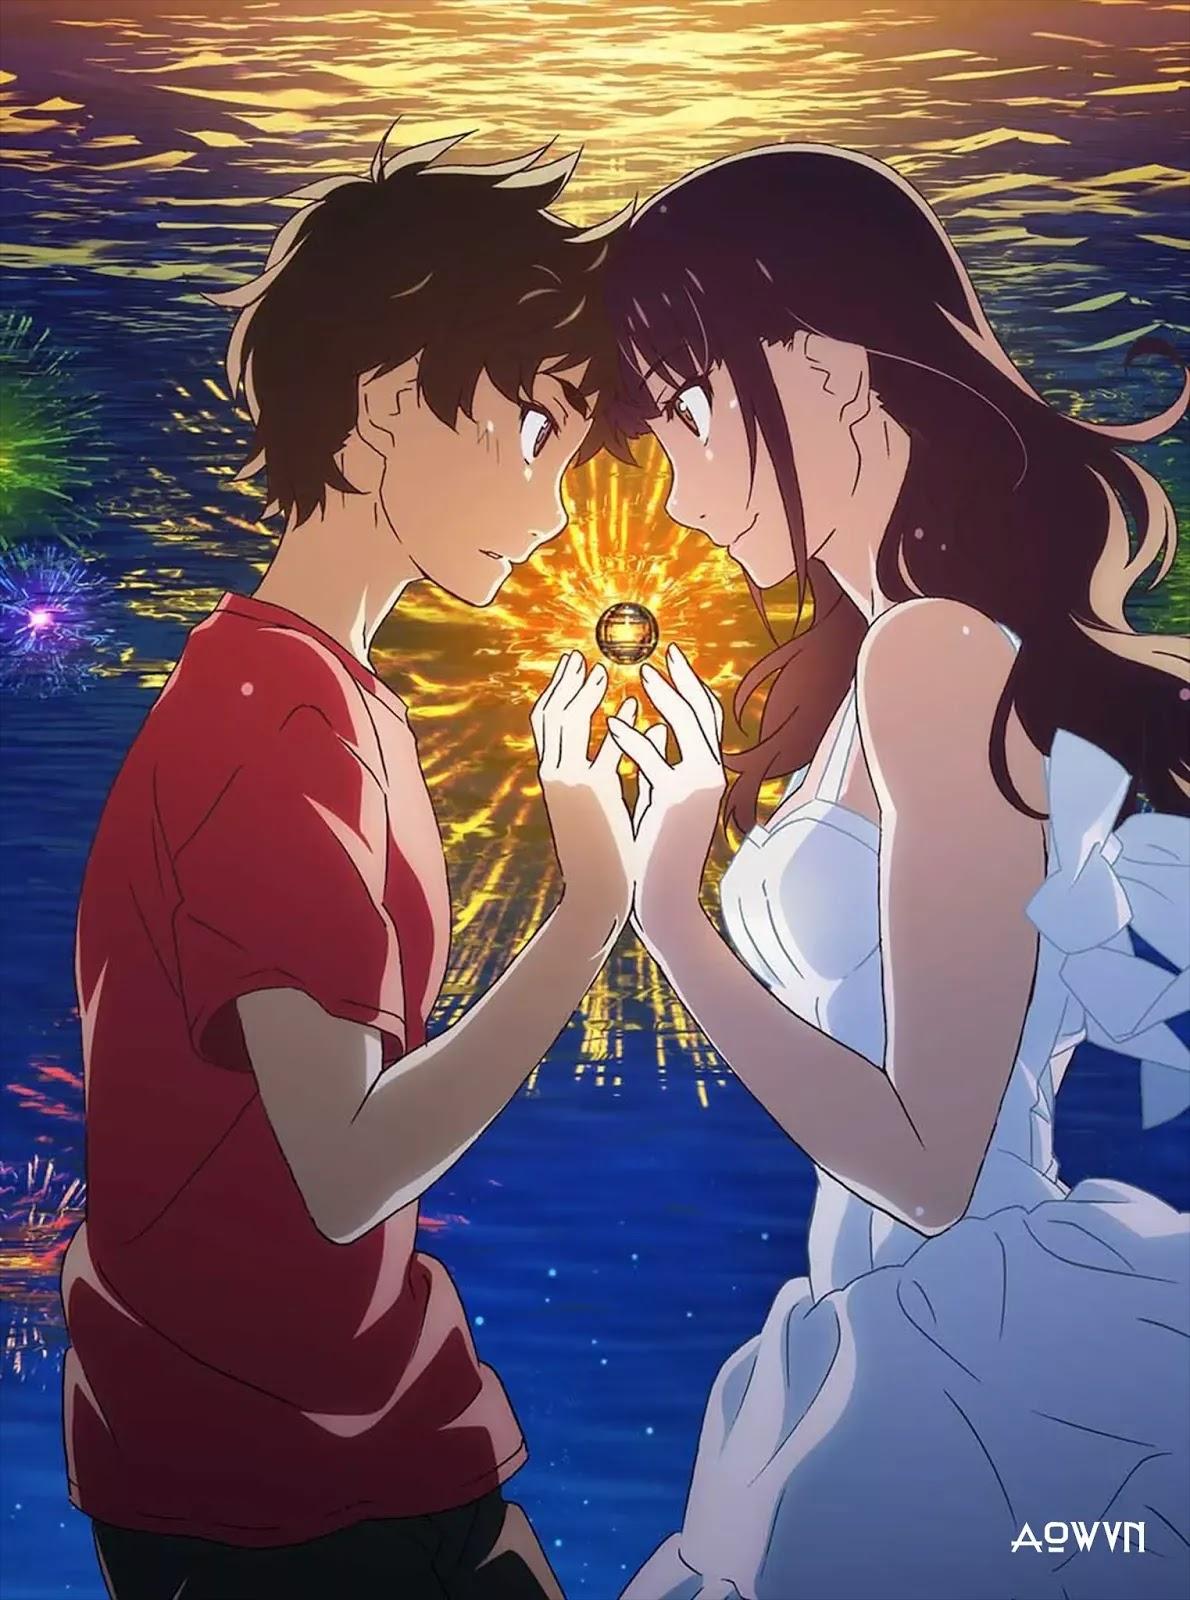 AowVN.org minz%2B%252813%2529 - [ Hình Nền ] Anime Uchiage Hanabi Shita Kara Miru Ka cực đẹp | AowVN Wallpapers